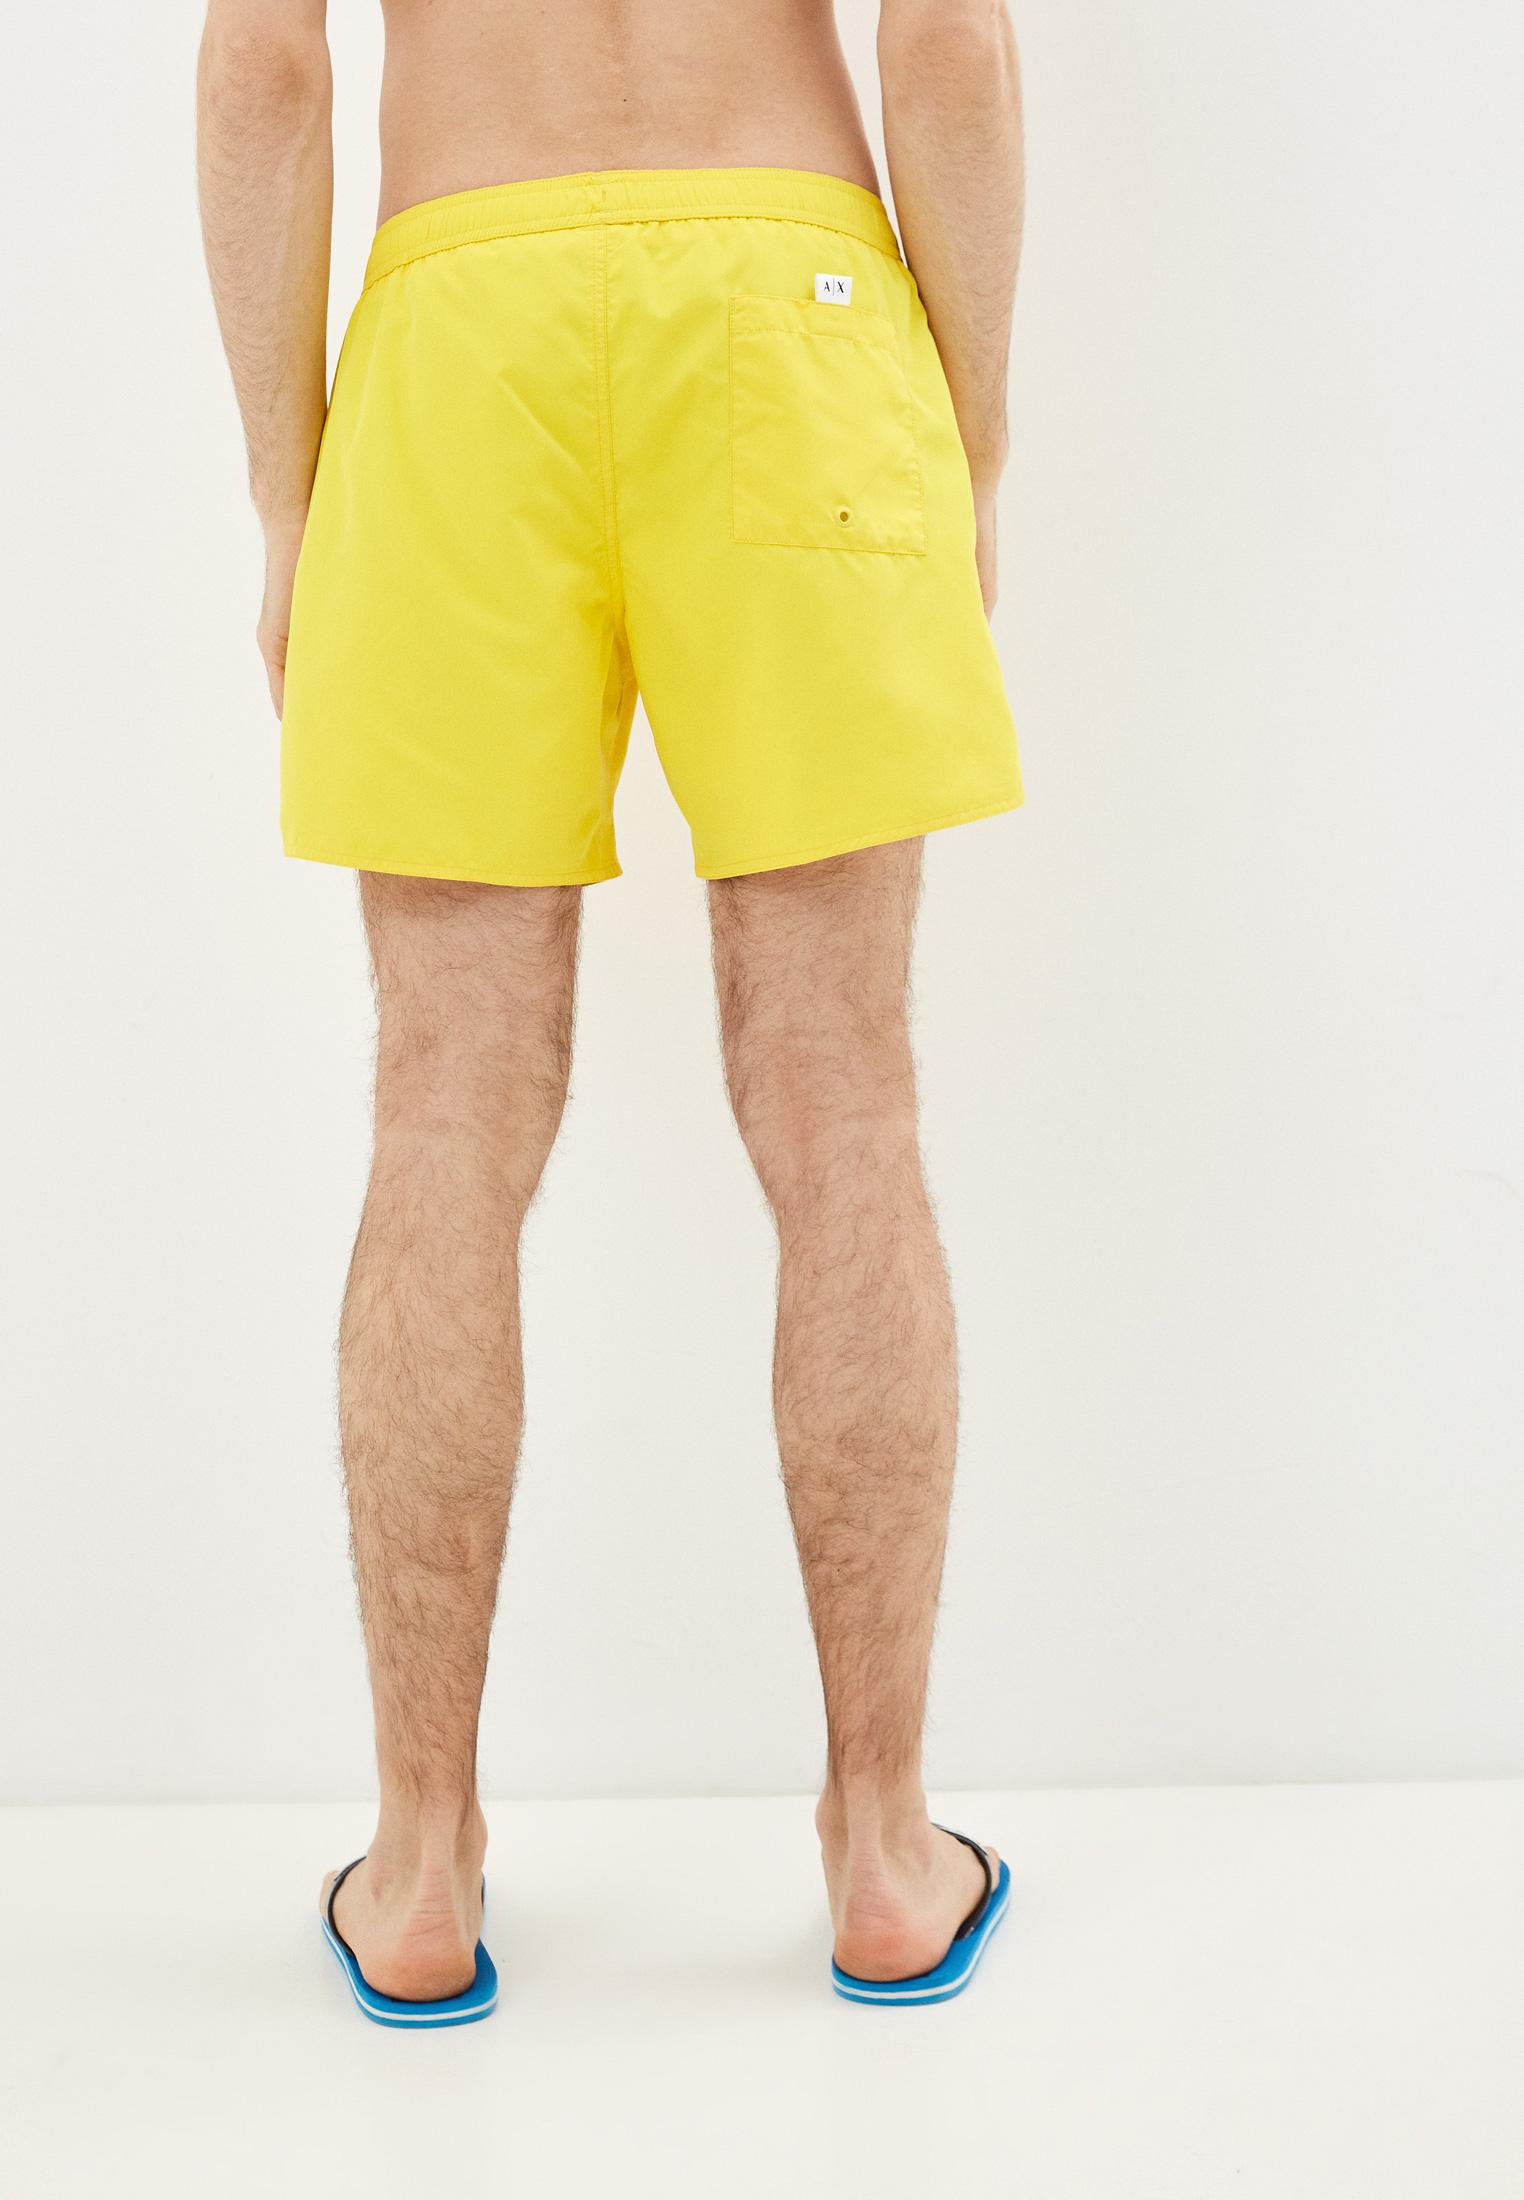 Мужские шорты для плавания Armani Exchange 953001 1P620